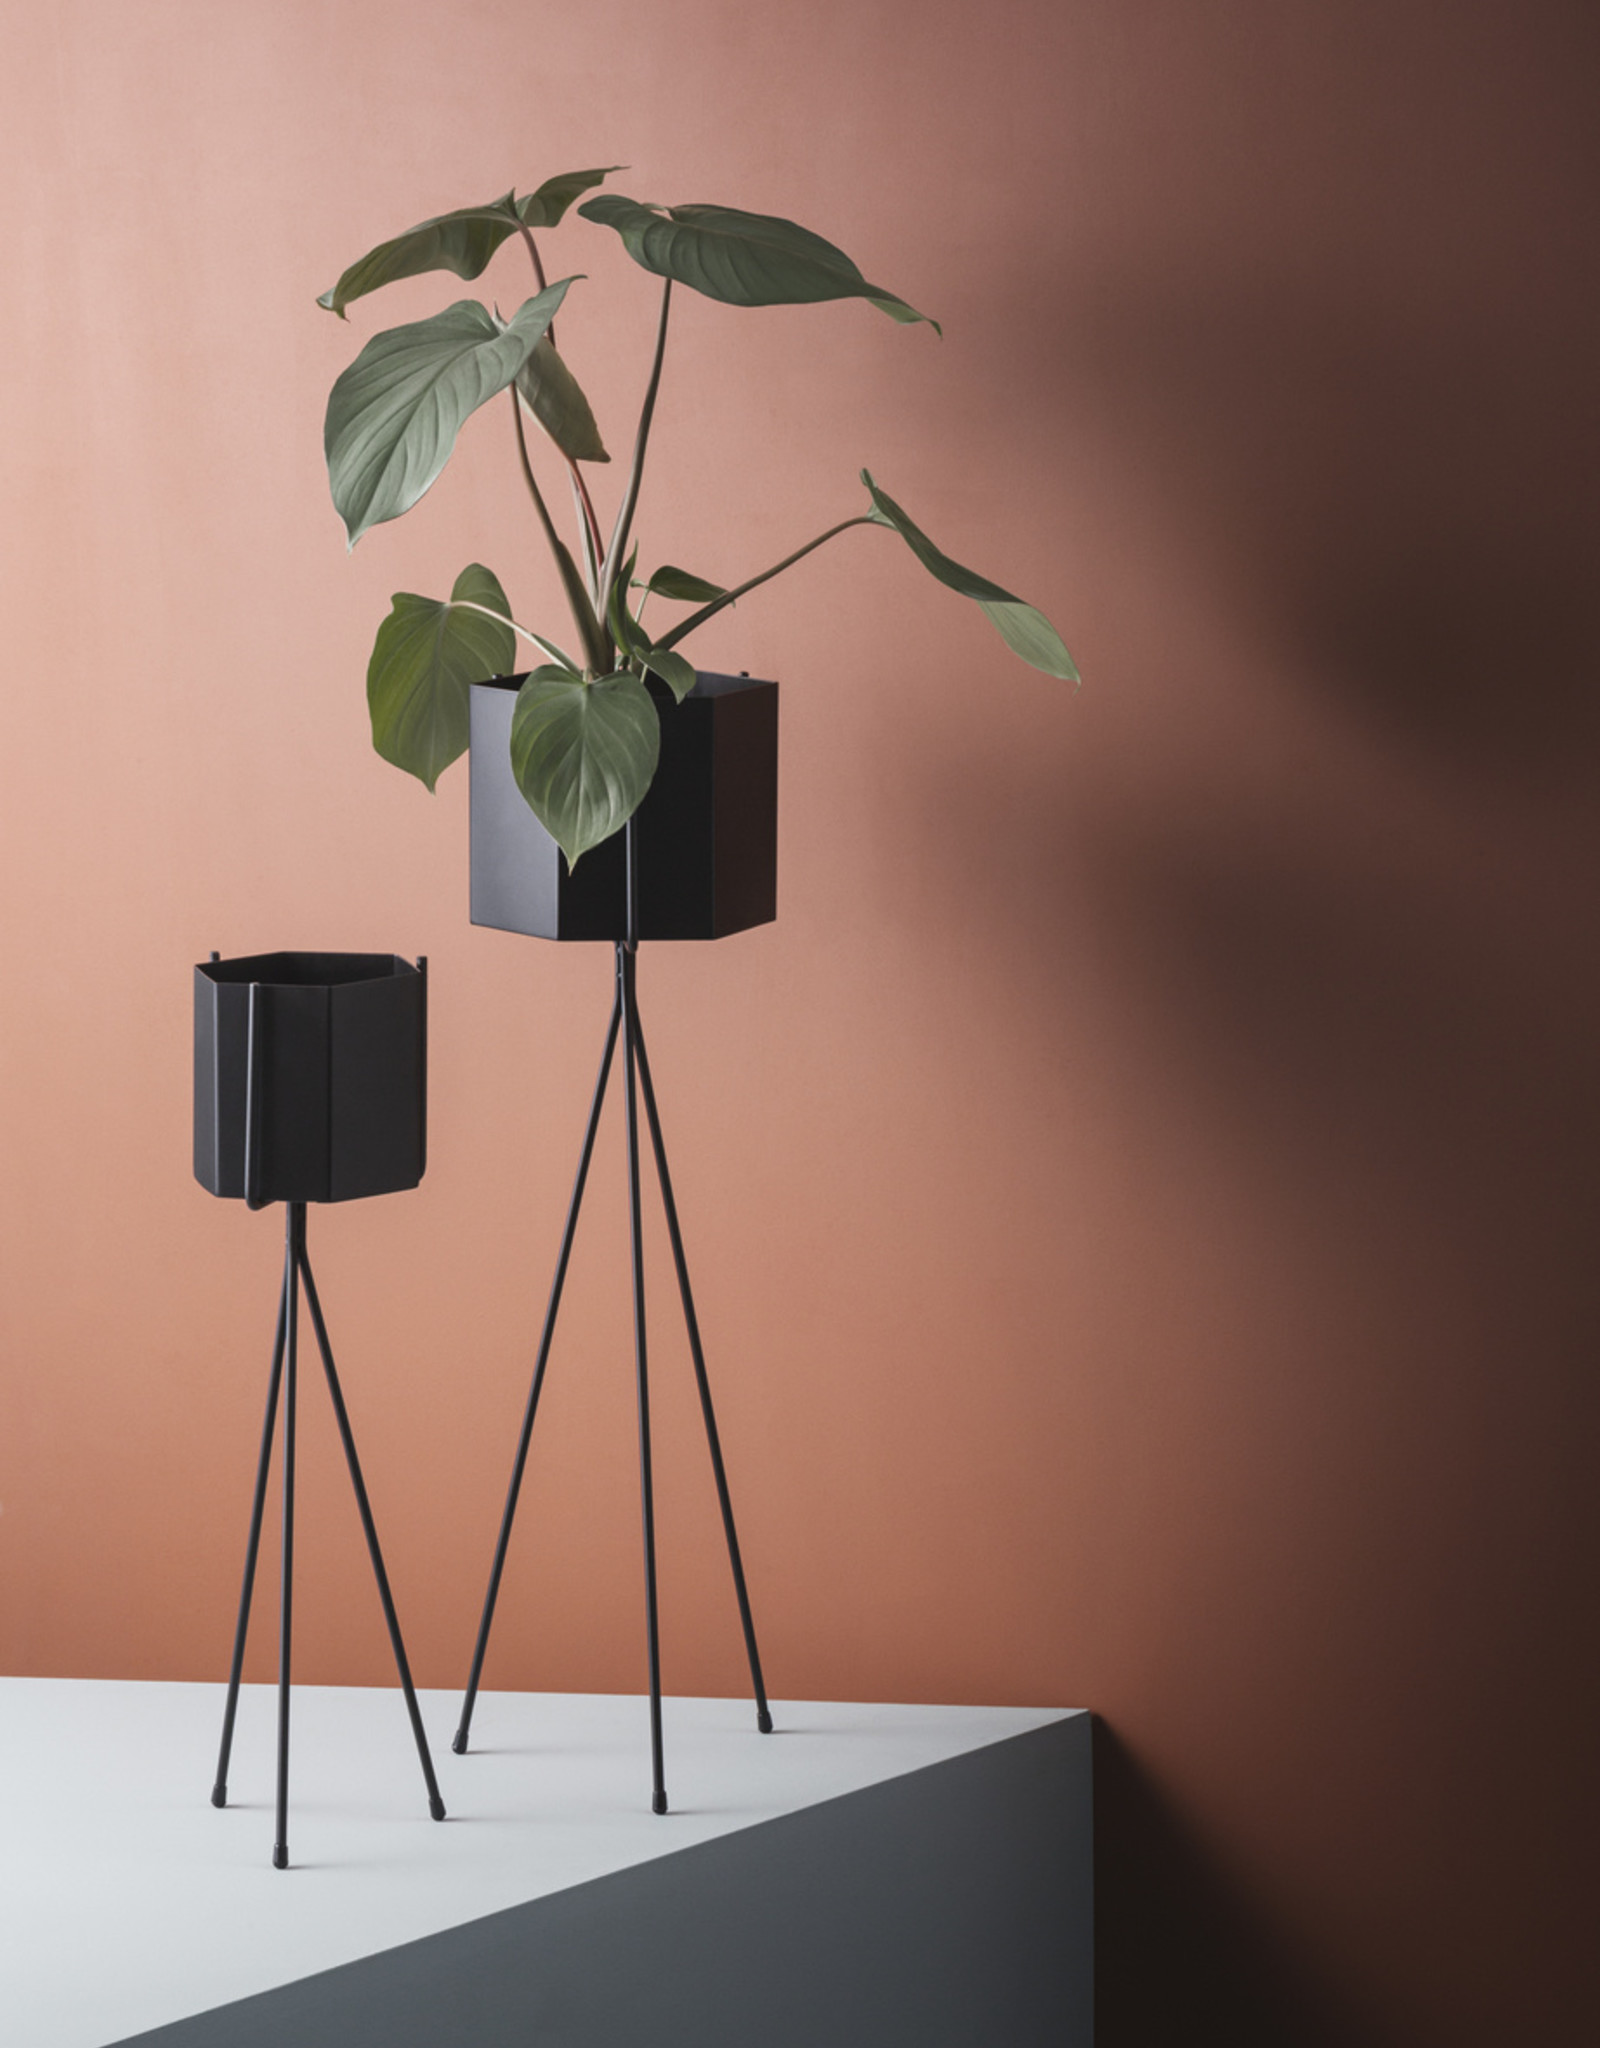 Ferm LIVING ferm LIVING Plant Stand - Light Grey - Low